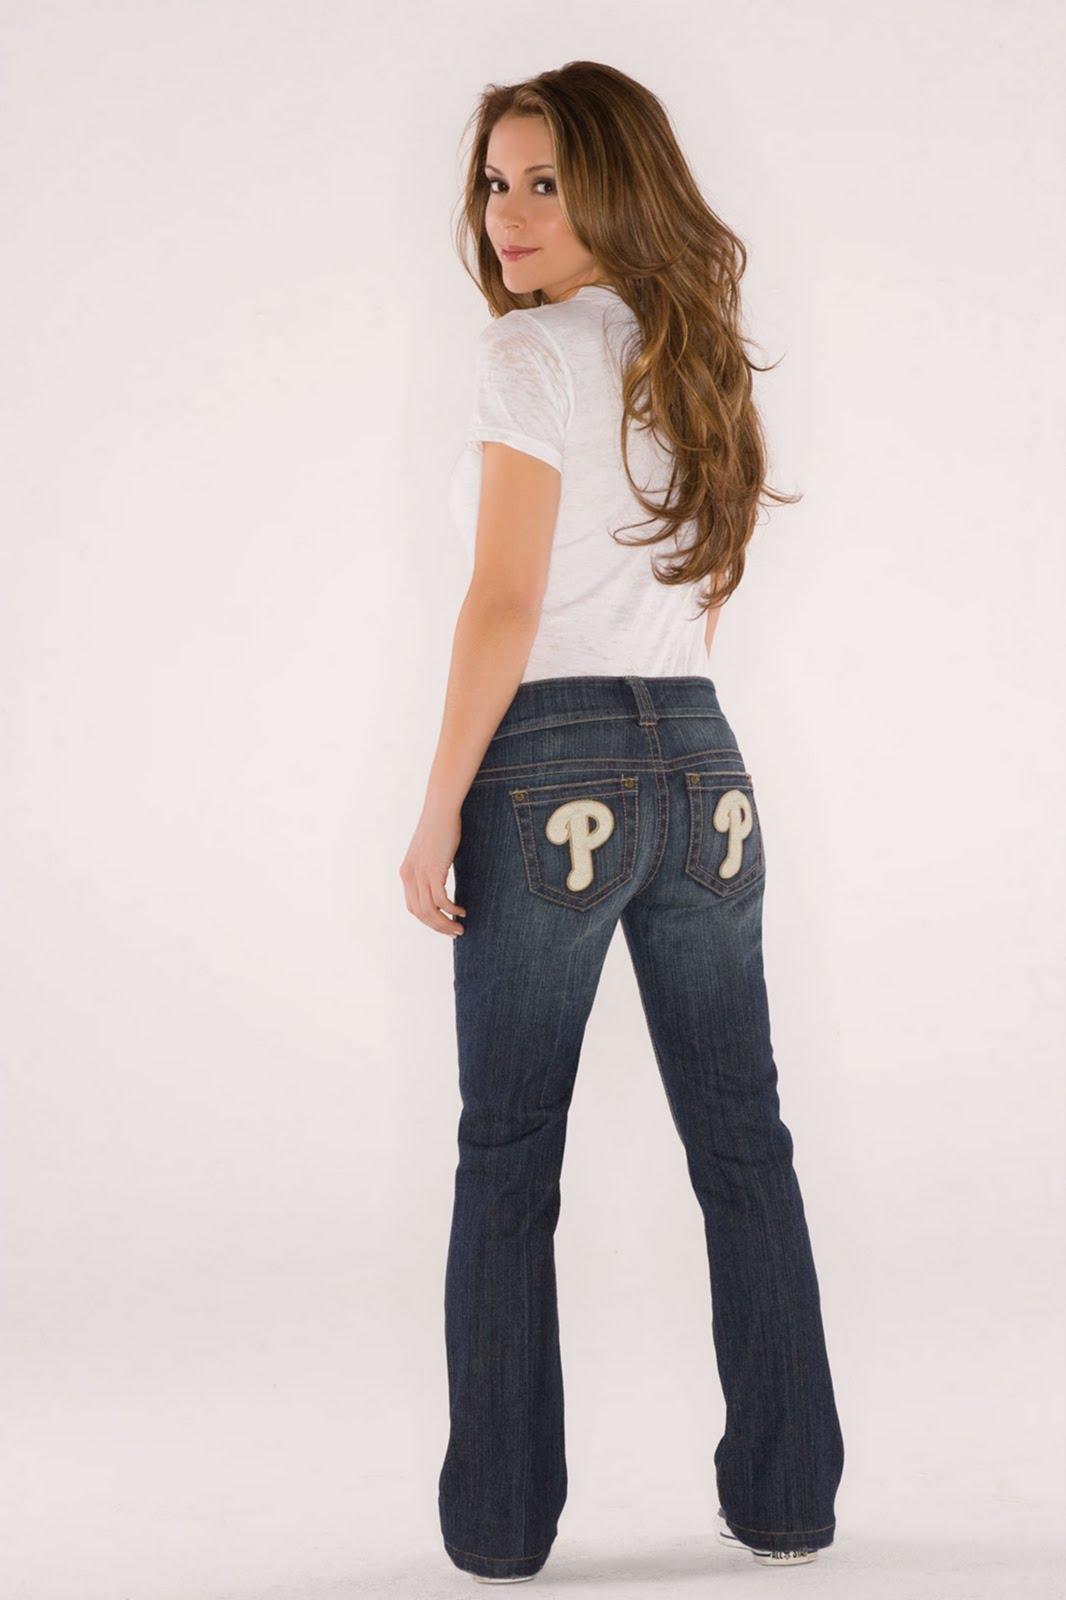 http://1.bp.blogspot.com/_zbsfJpJk1lA/S70ygVDgFFI/AAAAAAAAI38/0JXZoSlOOf8/s1600/alyssa_milano_crush_wear_4.jpg